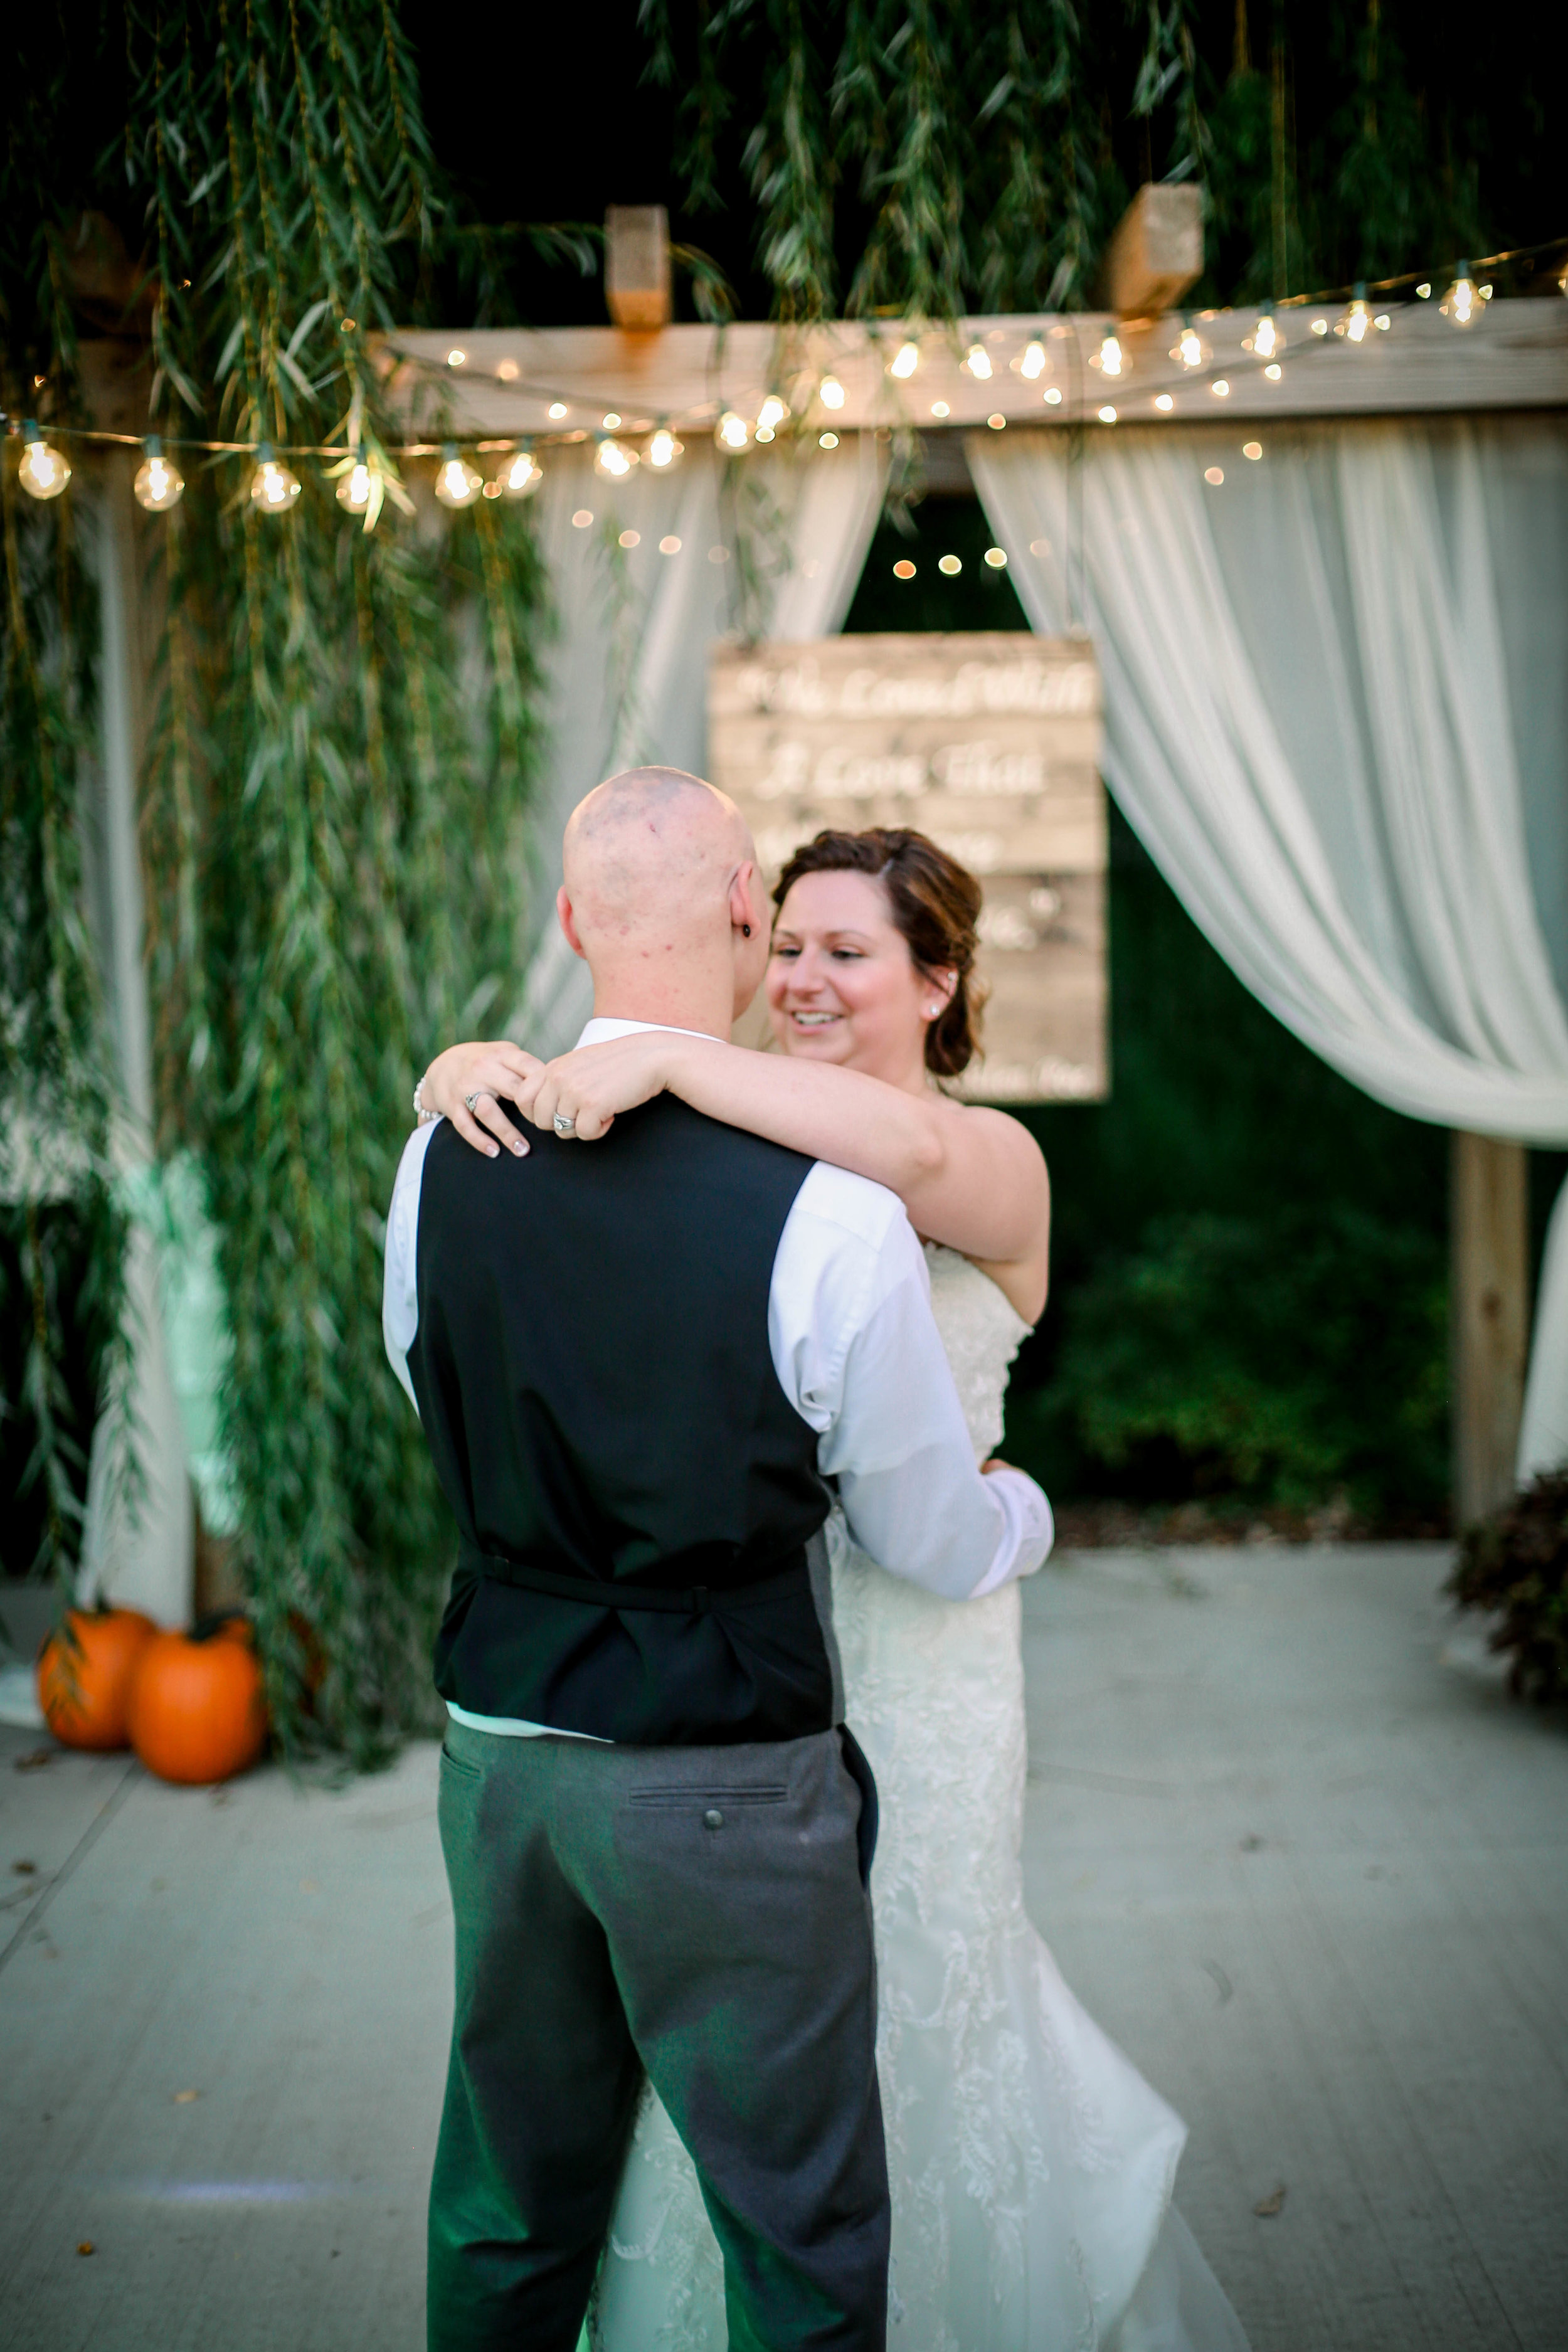 Anthony and Tiffany's Wedding (673 of 693).jpg